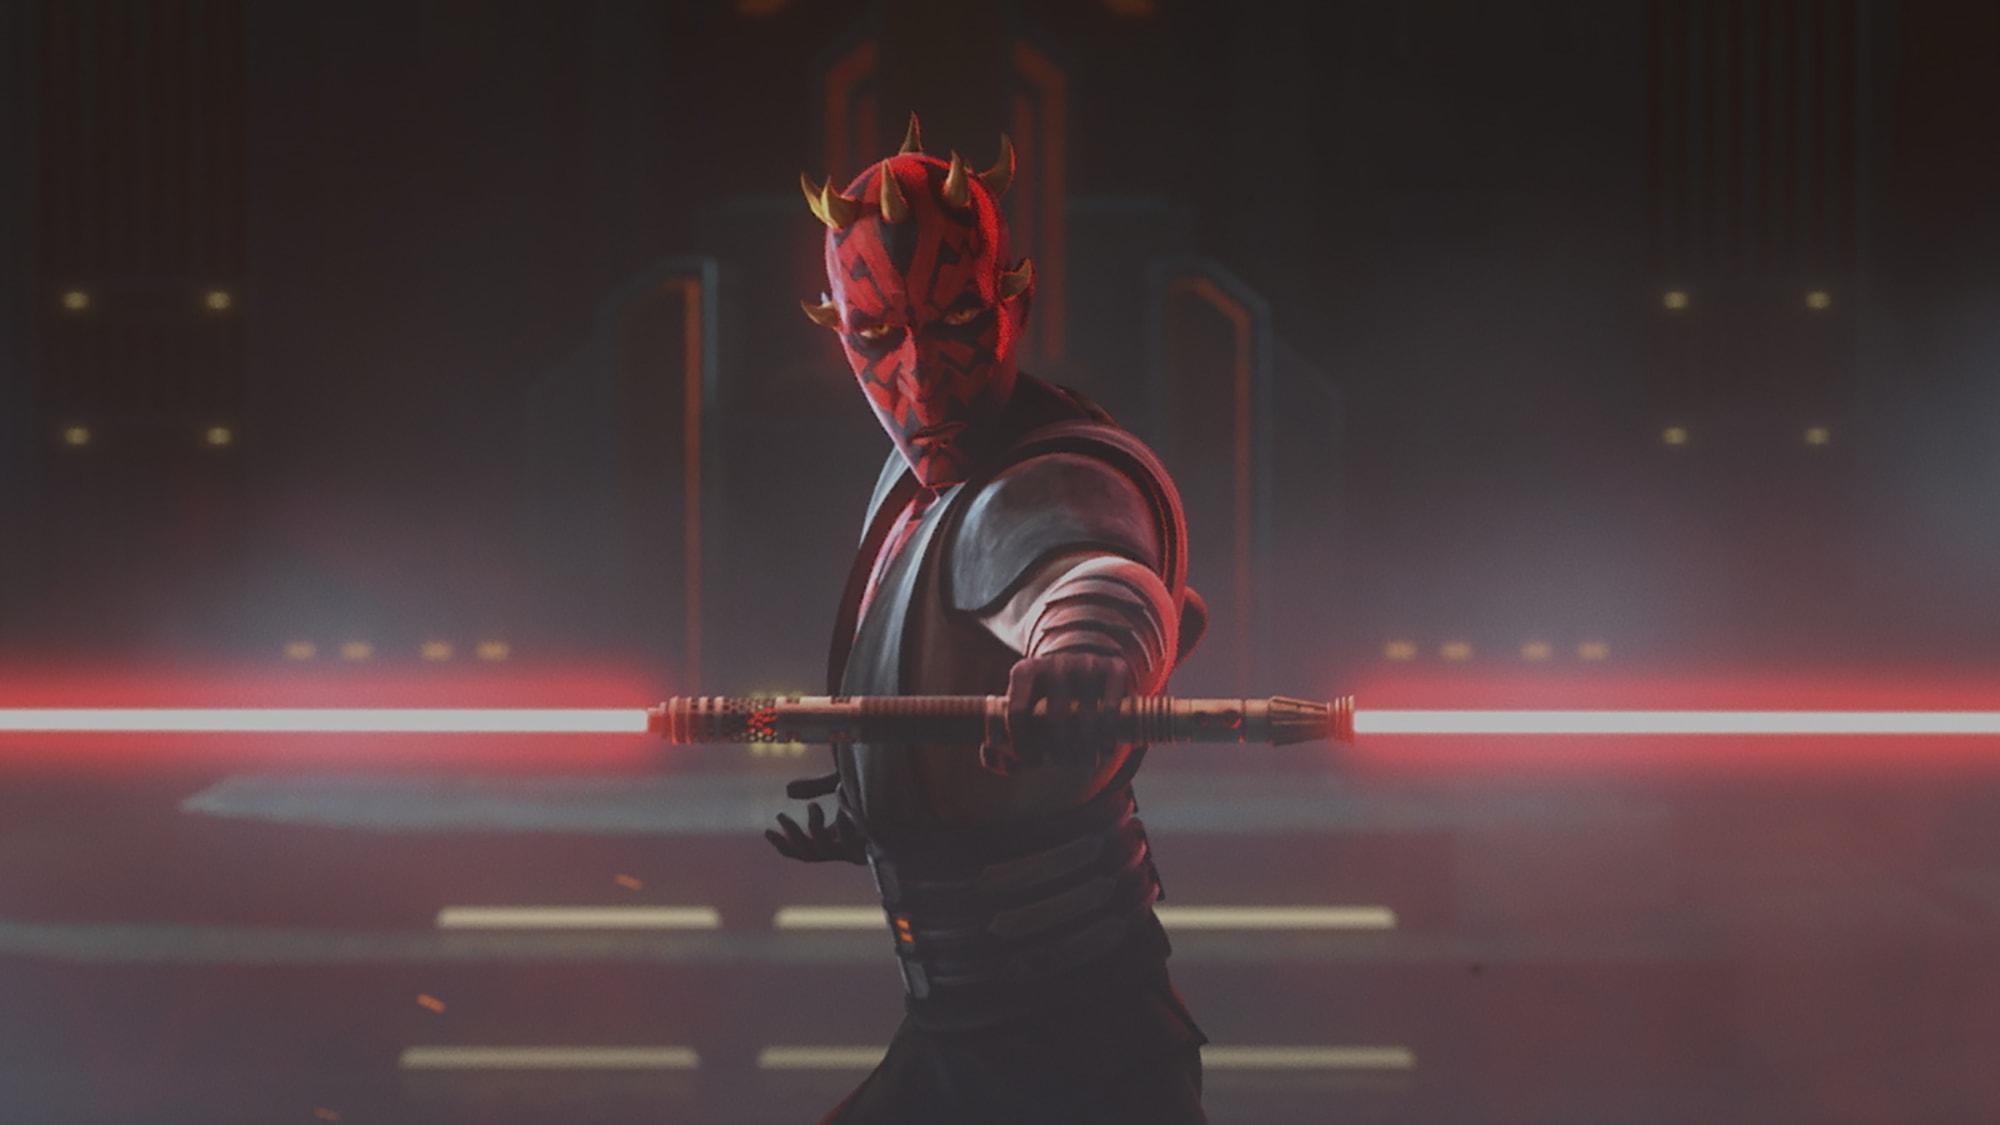 Star Wars: Darth Vader's next chapter could involve Darth Maul